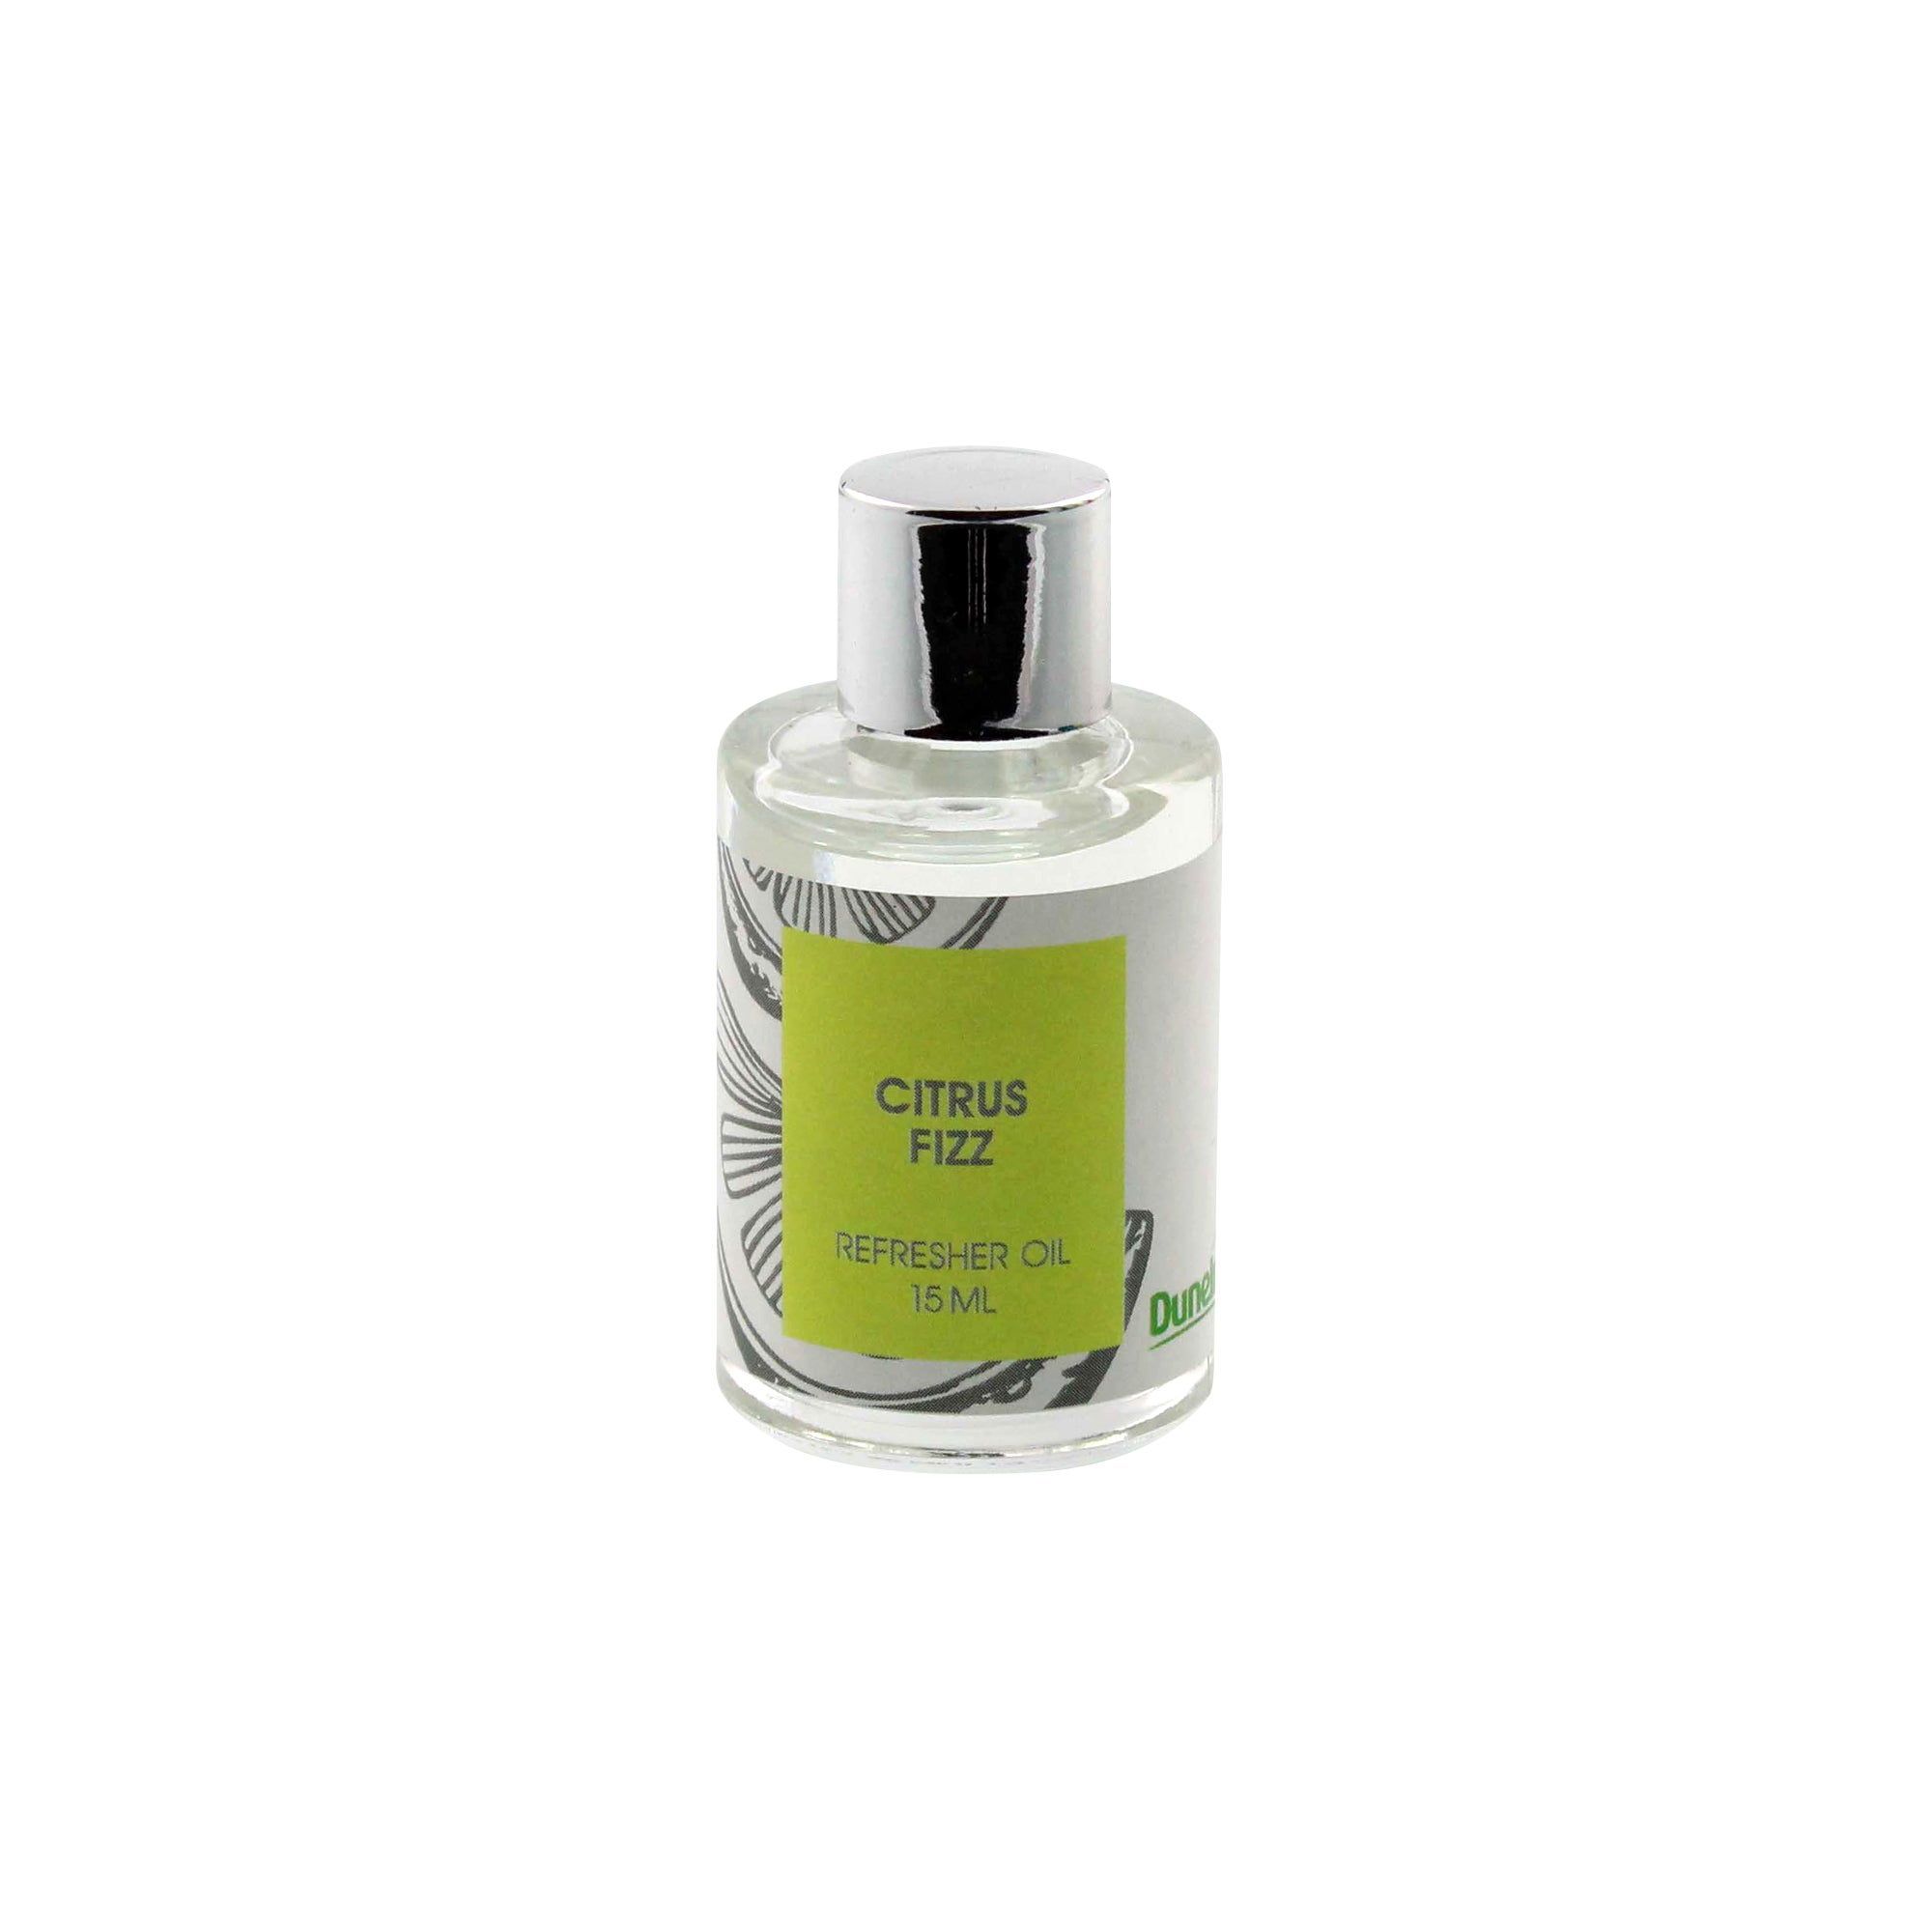 Citrus Fizz Refresher Oil